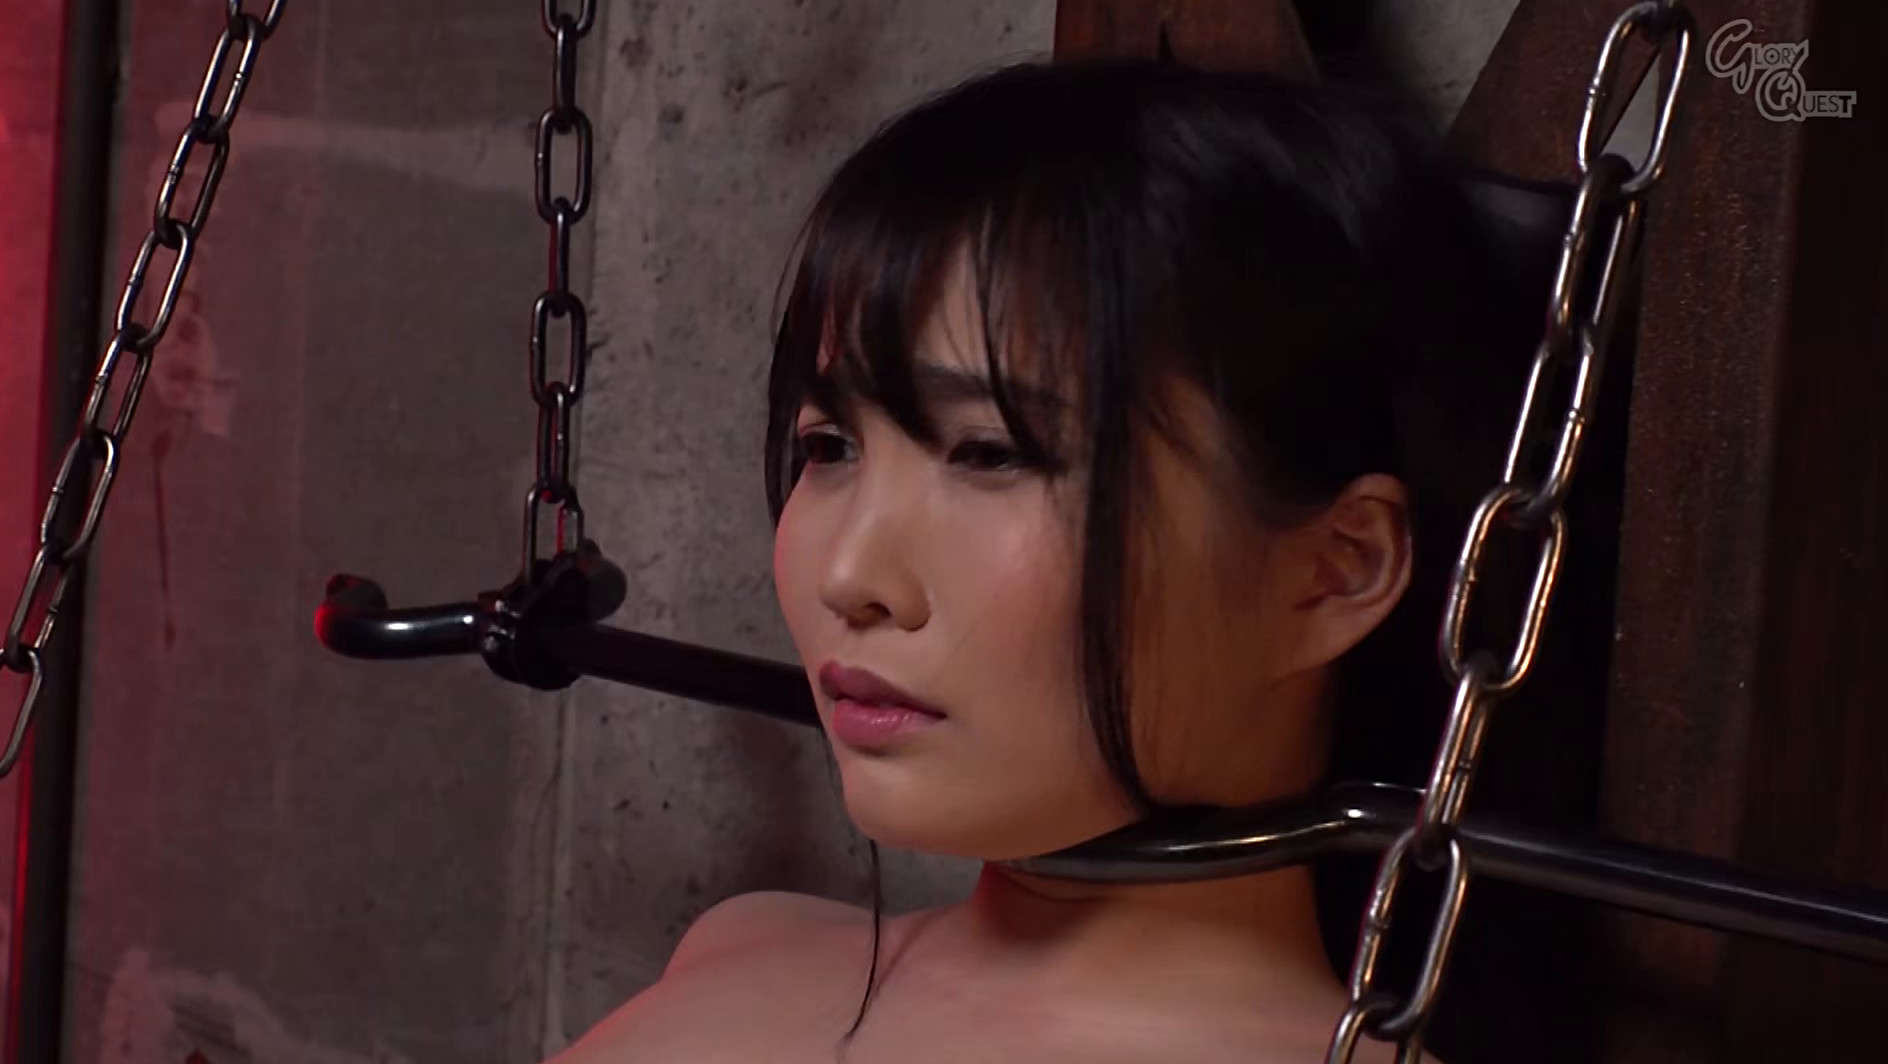 Ma○ko Device Bondage 21 鉄拘束マ○コ拷問 枢木あおい 画像12